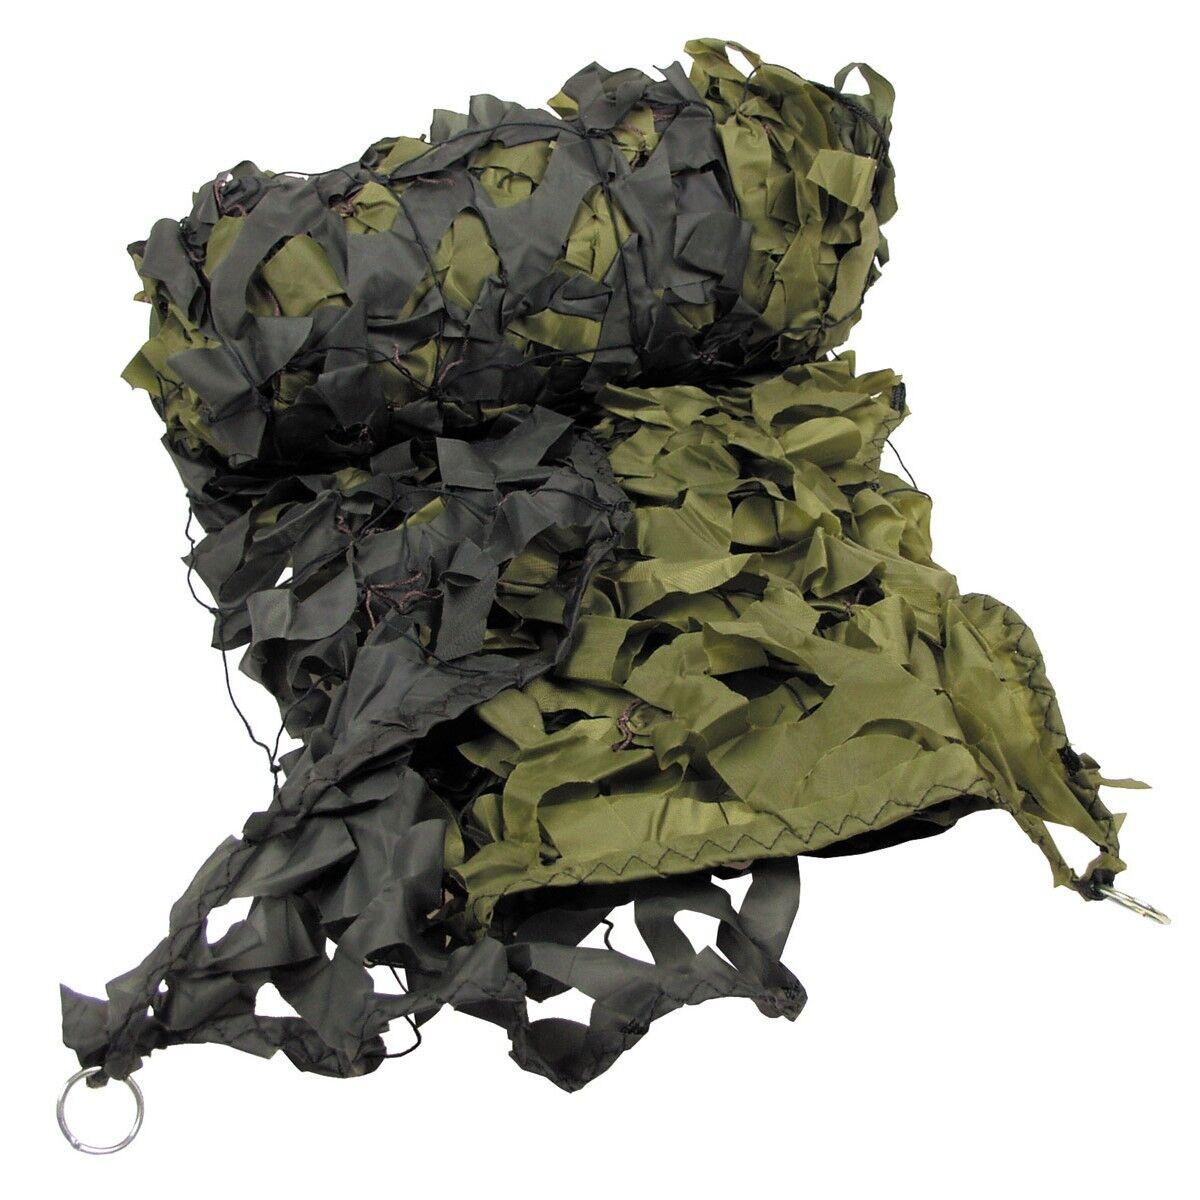 Tarnnetz 3 x 2 m, oliv, mit PVC-Tragebeutel  | Optimaler Preis